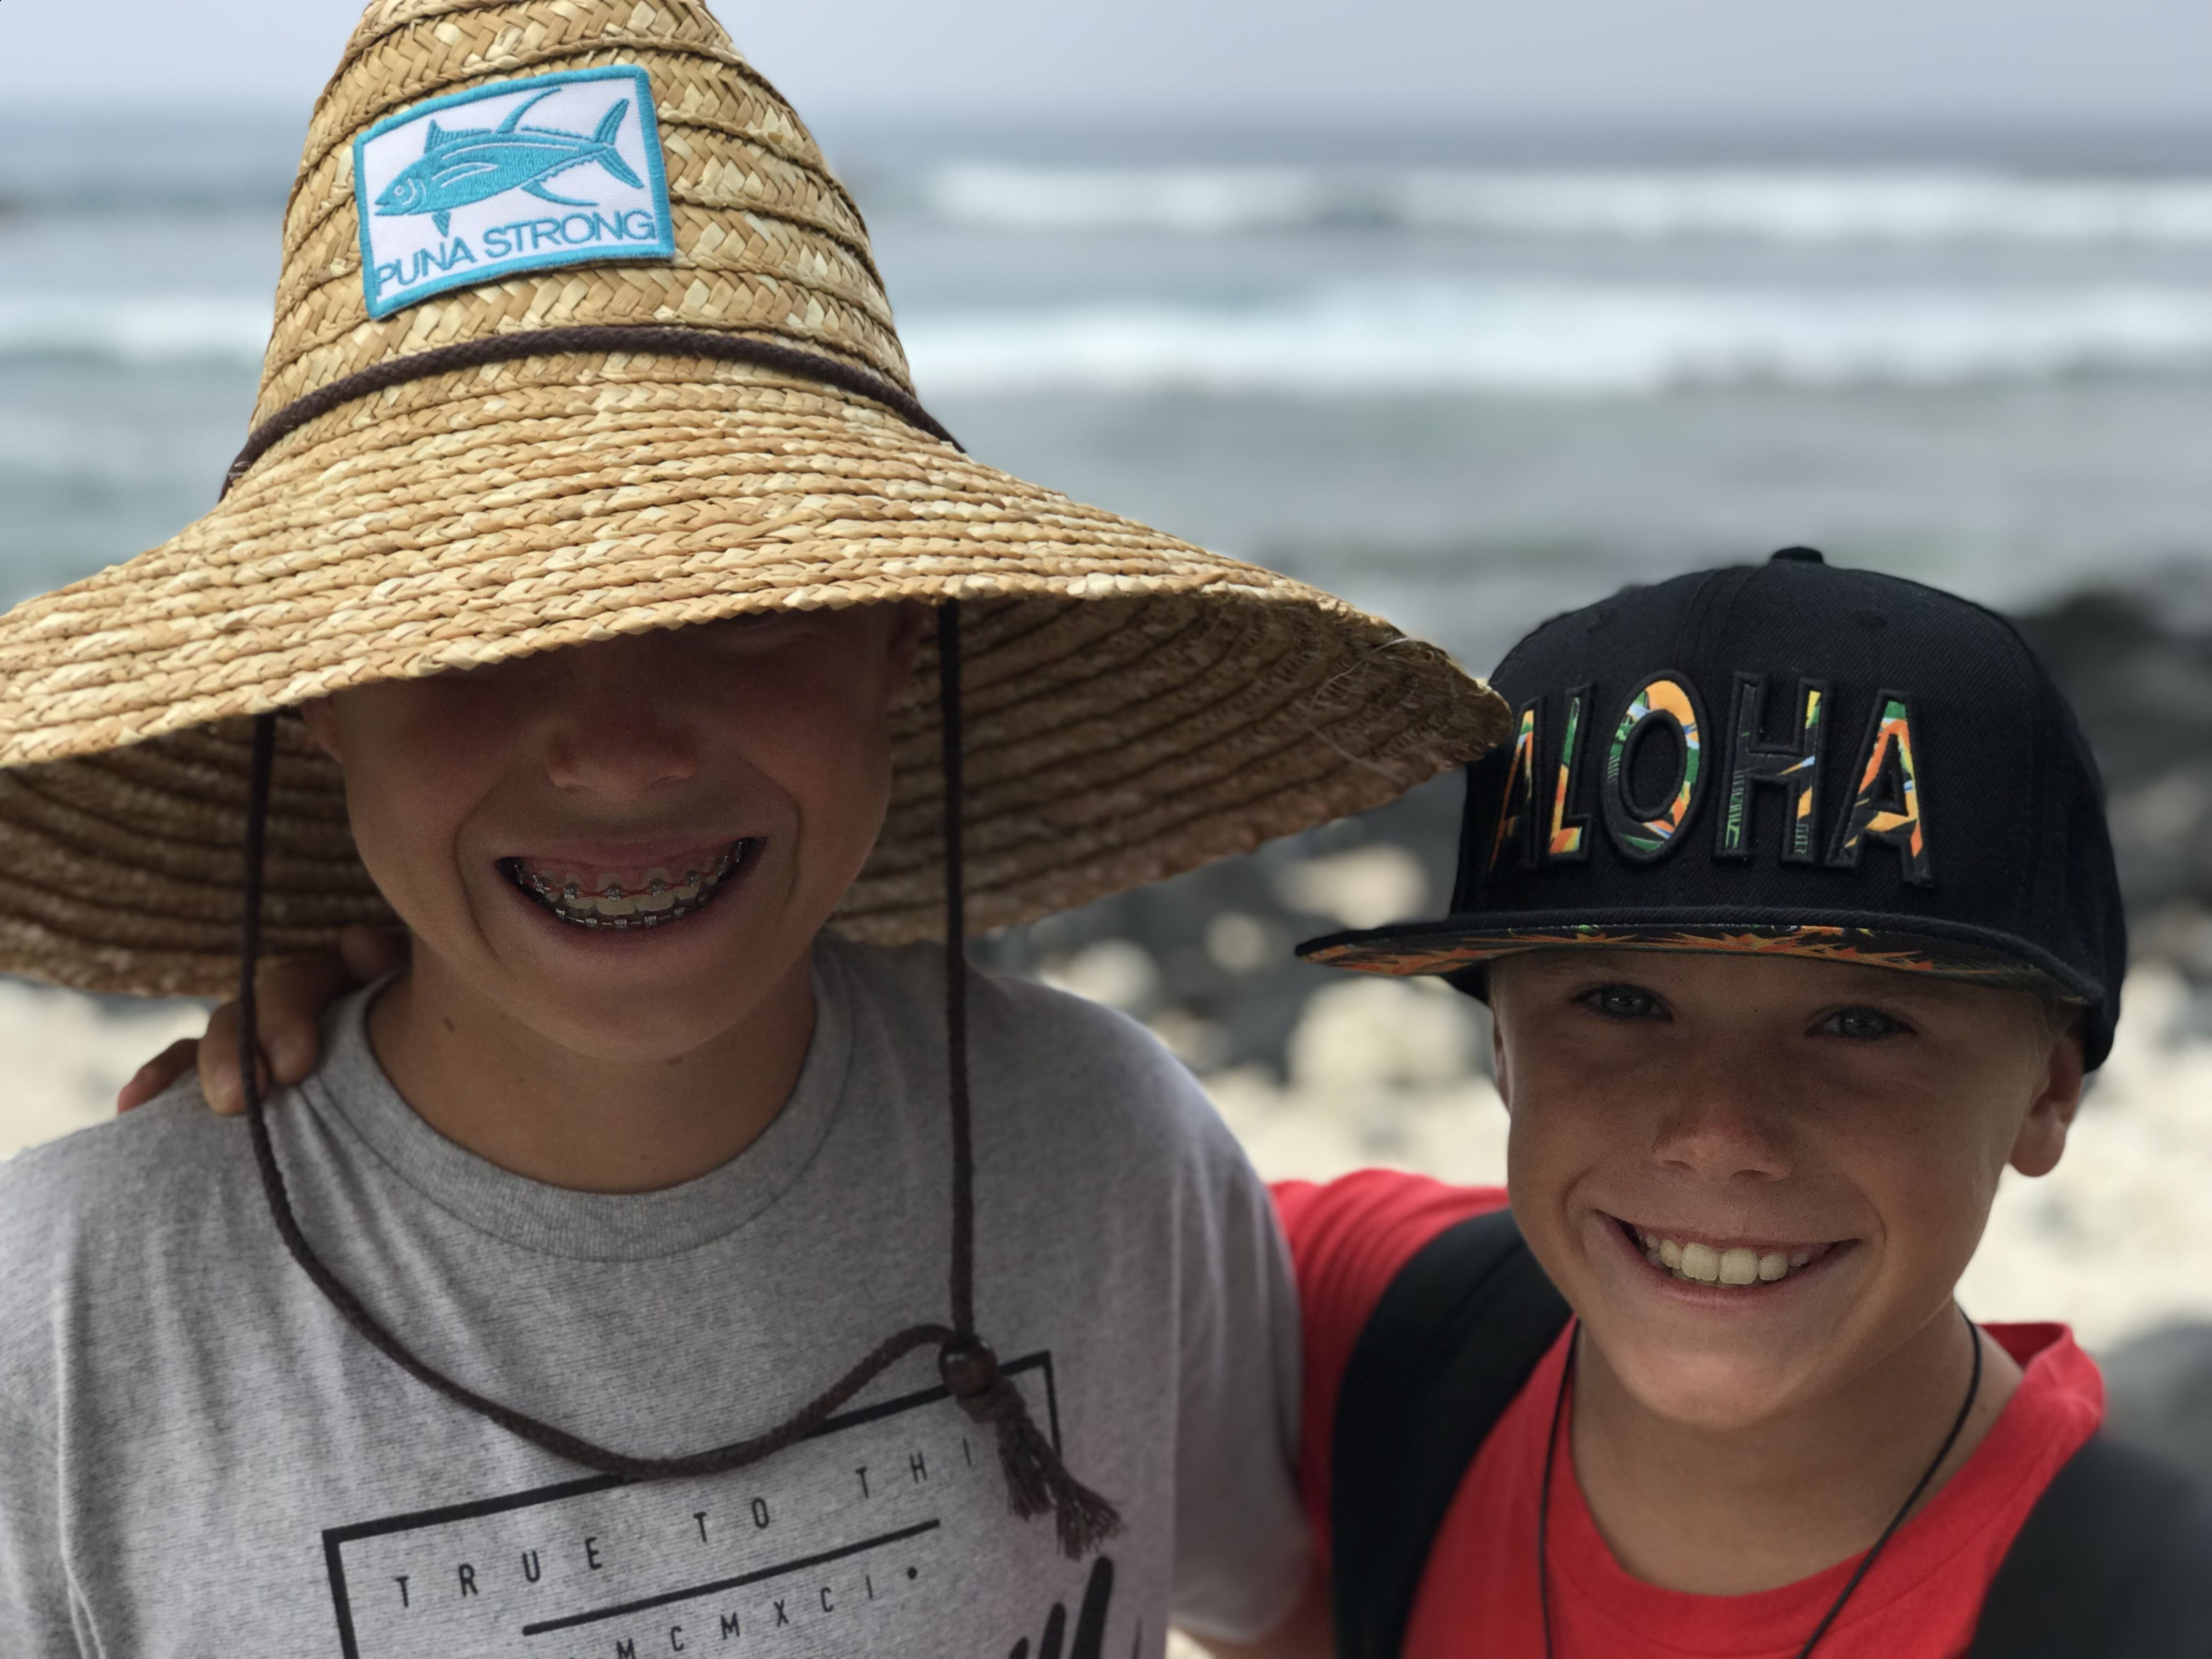 66fc4689e3500 Our Puna Strong Sundot Marine Patch Hat at Kohanaiki Beach.